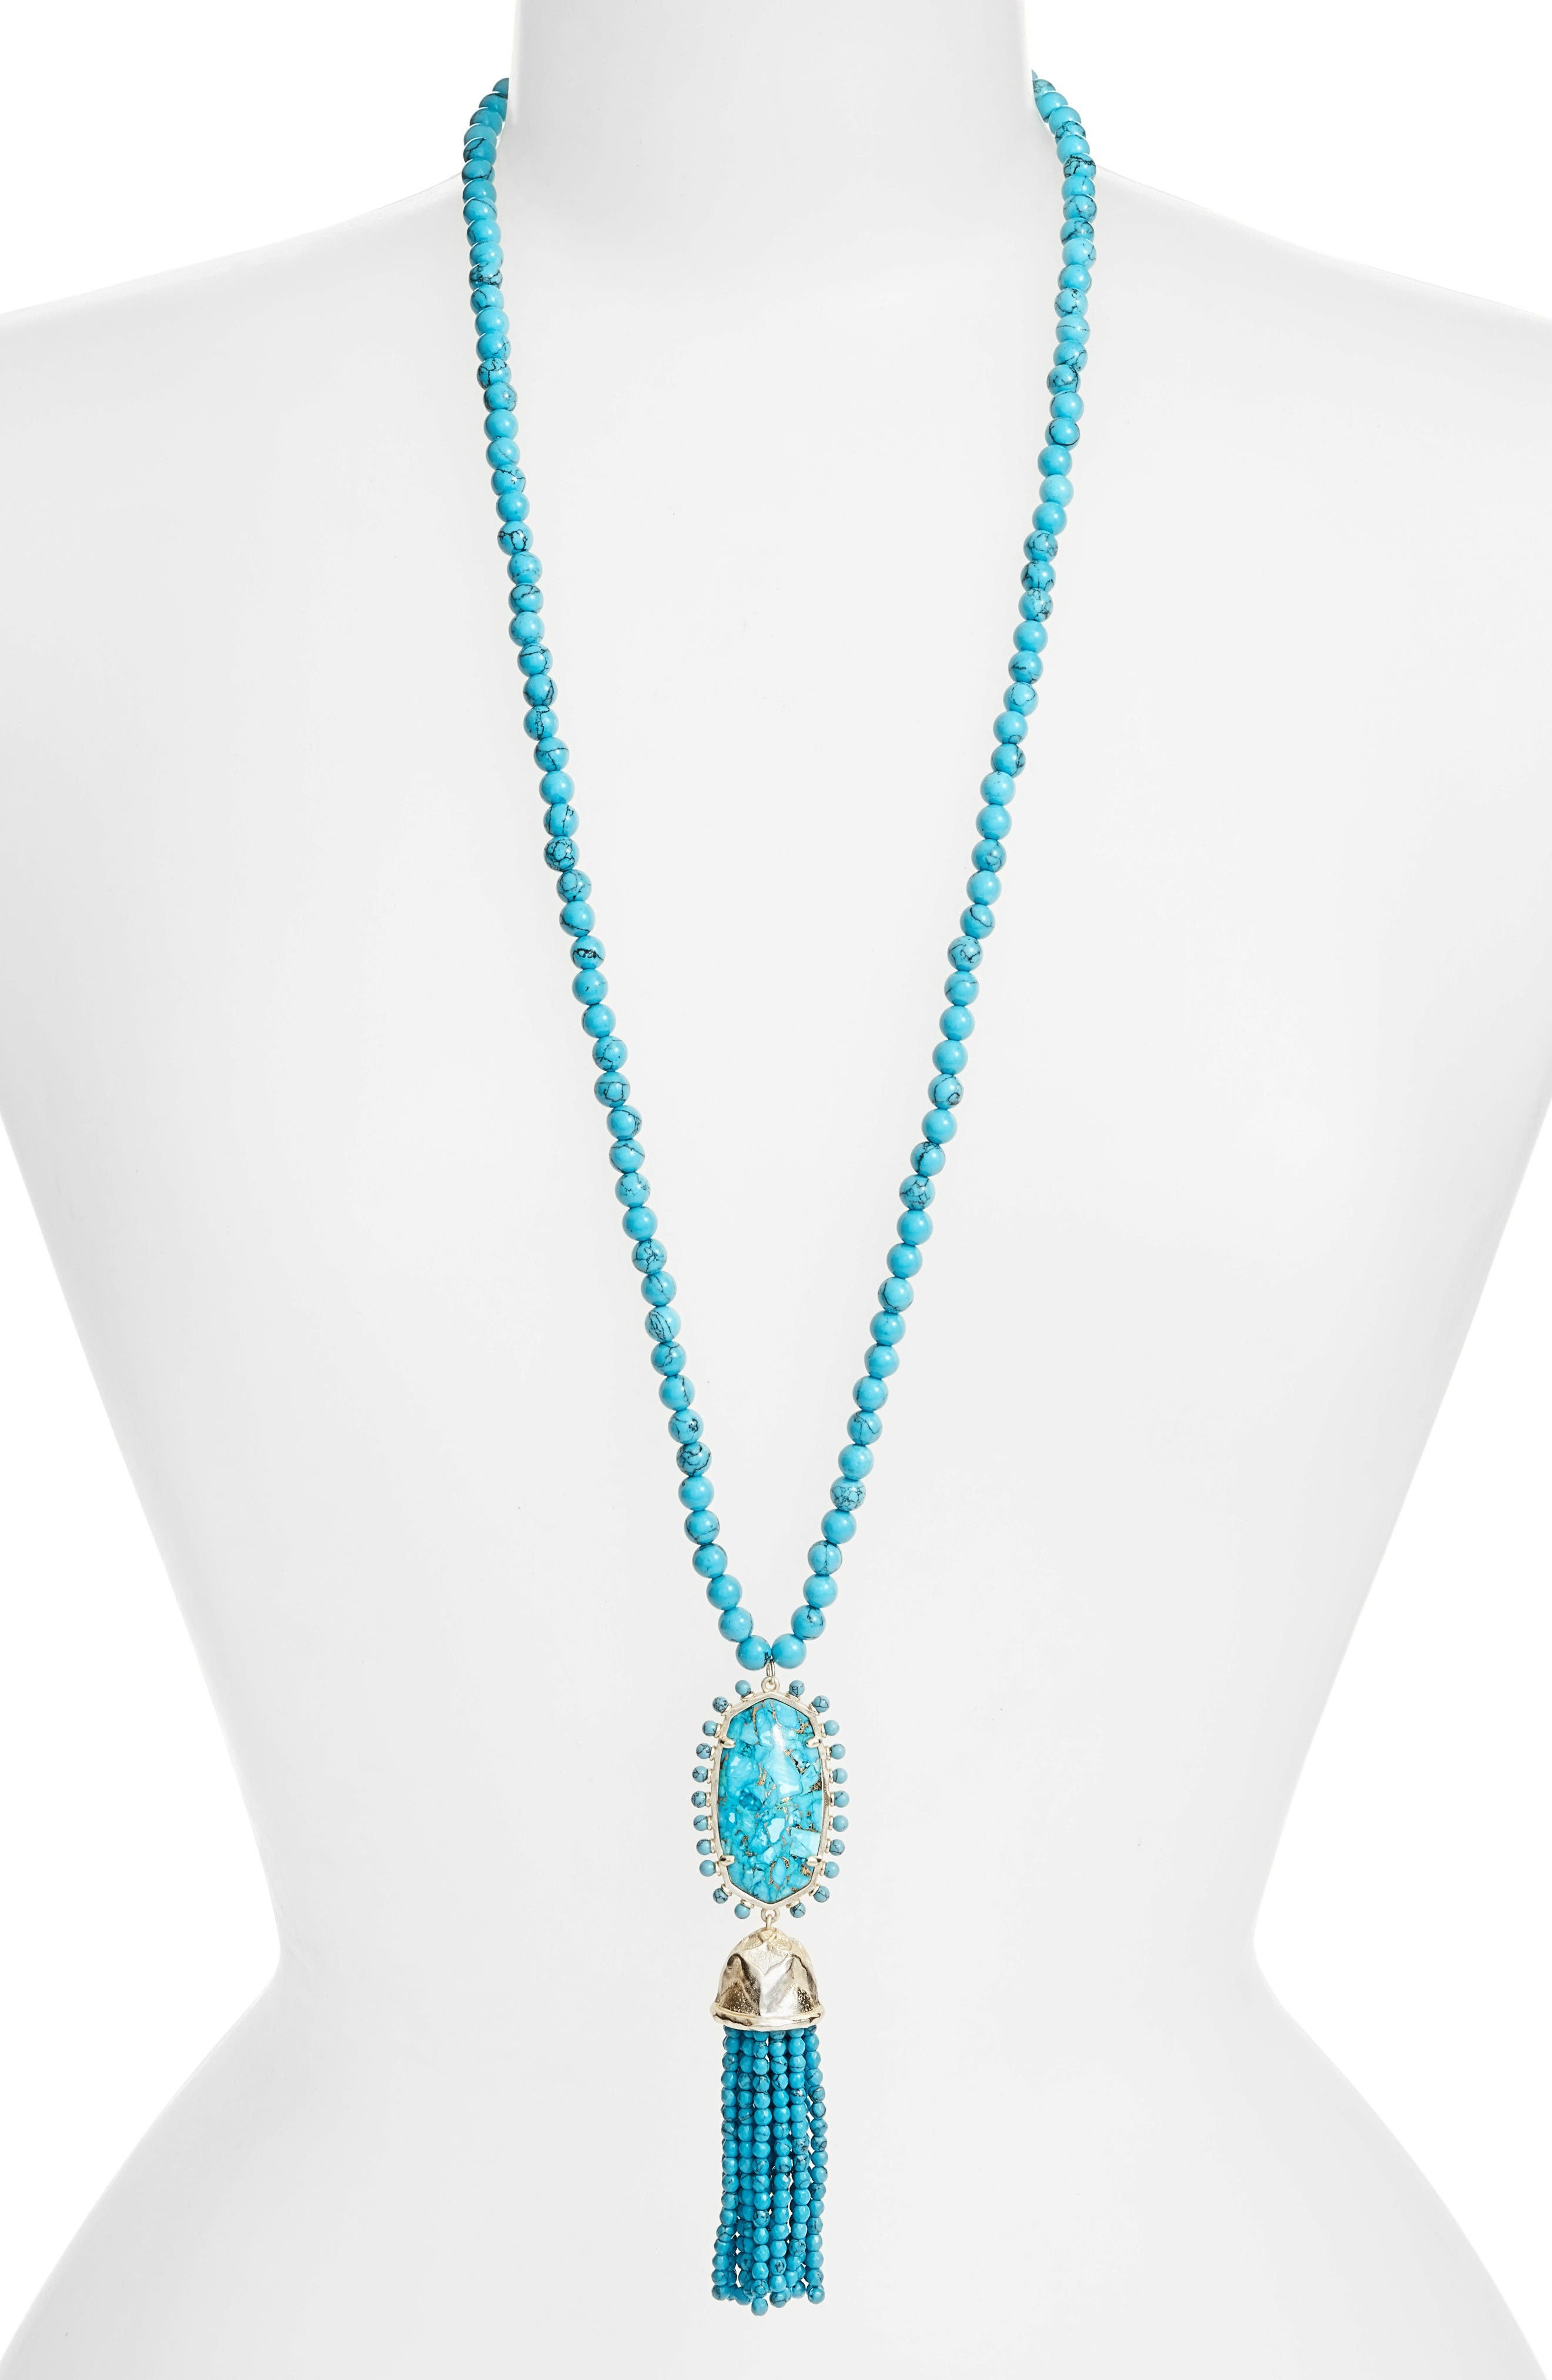 Main Image - Kendra Scott Tatiana Pendant Necklace